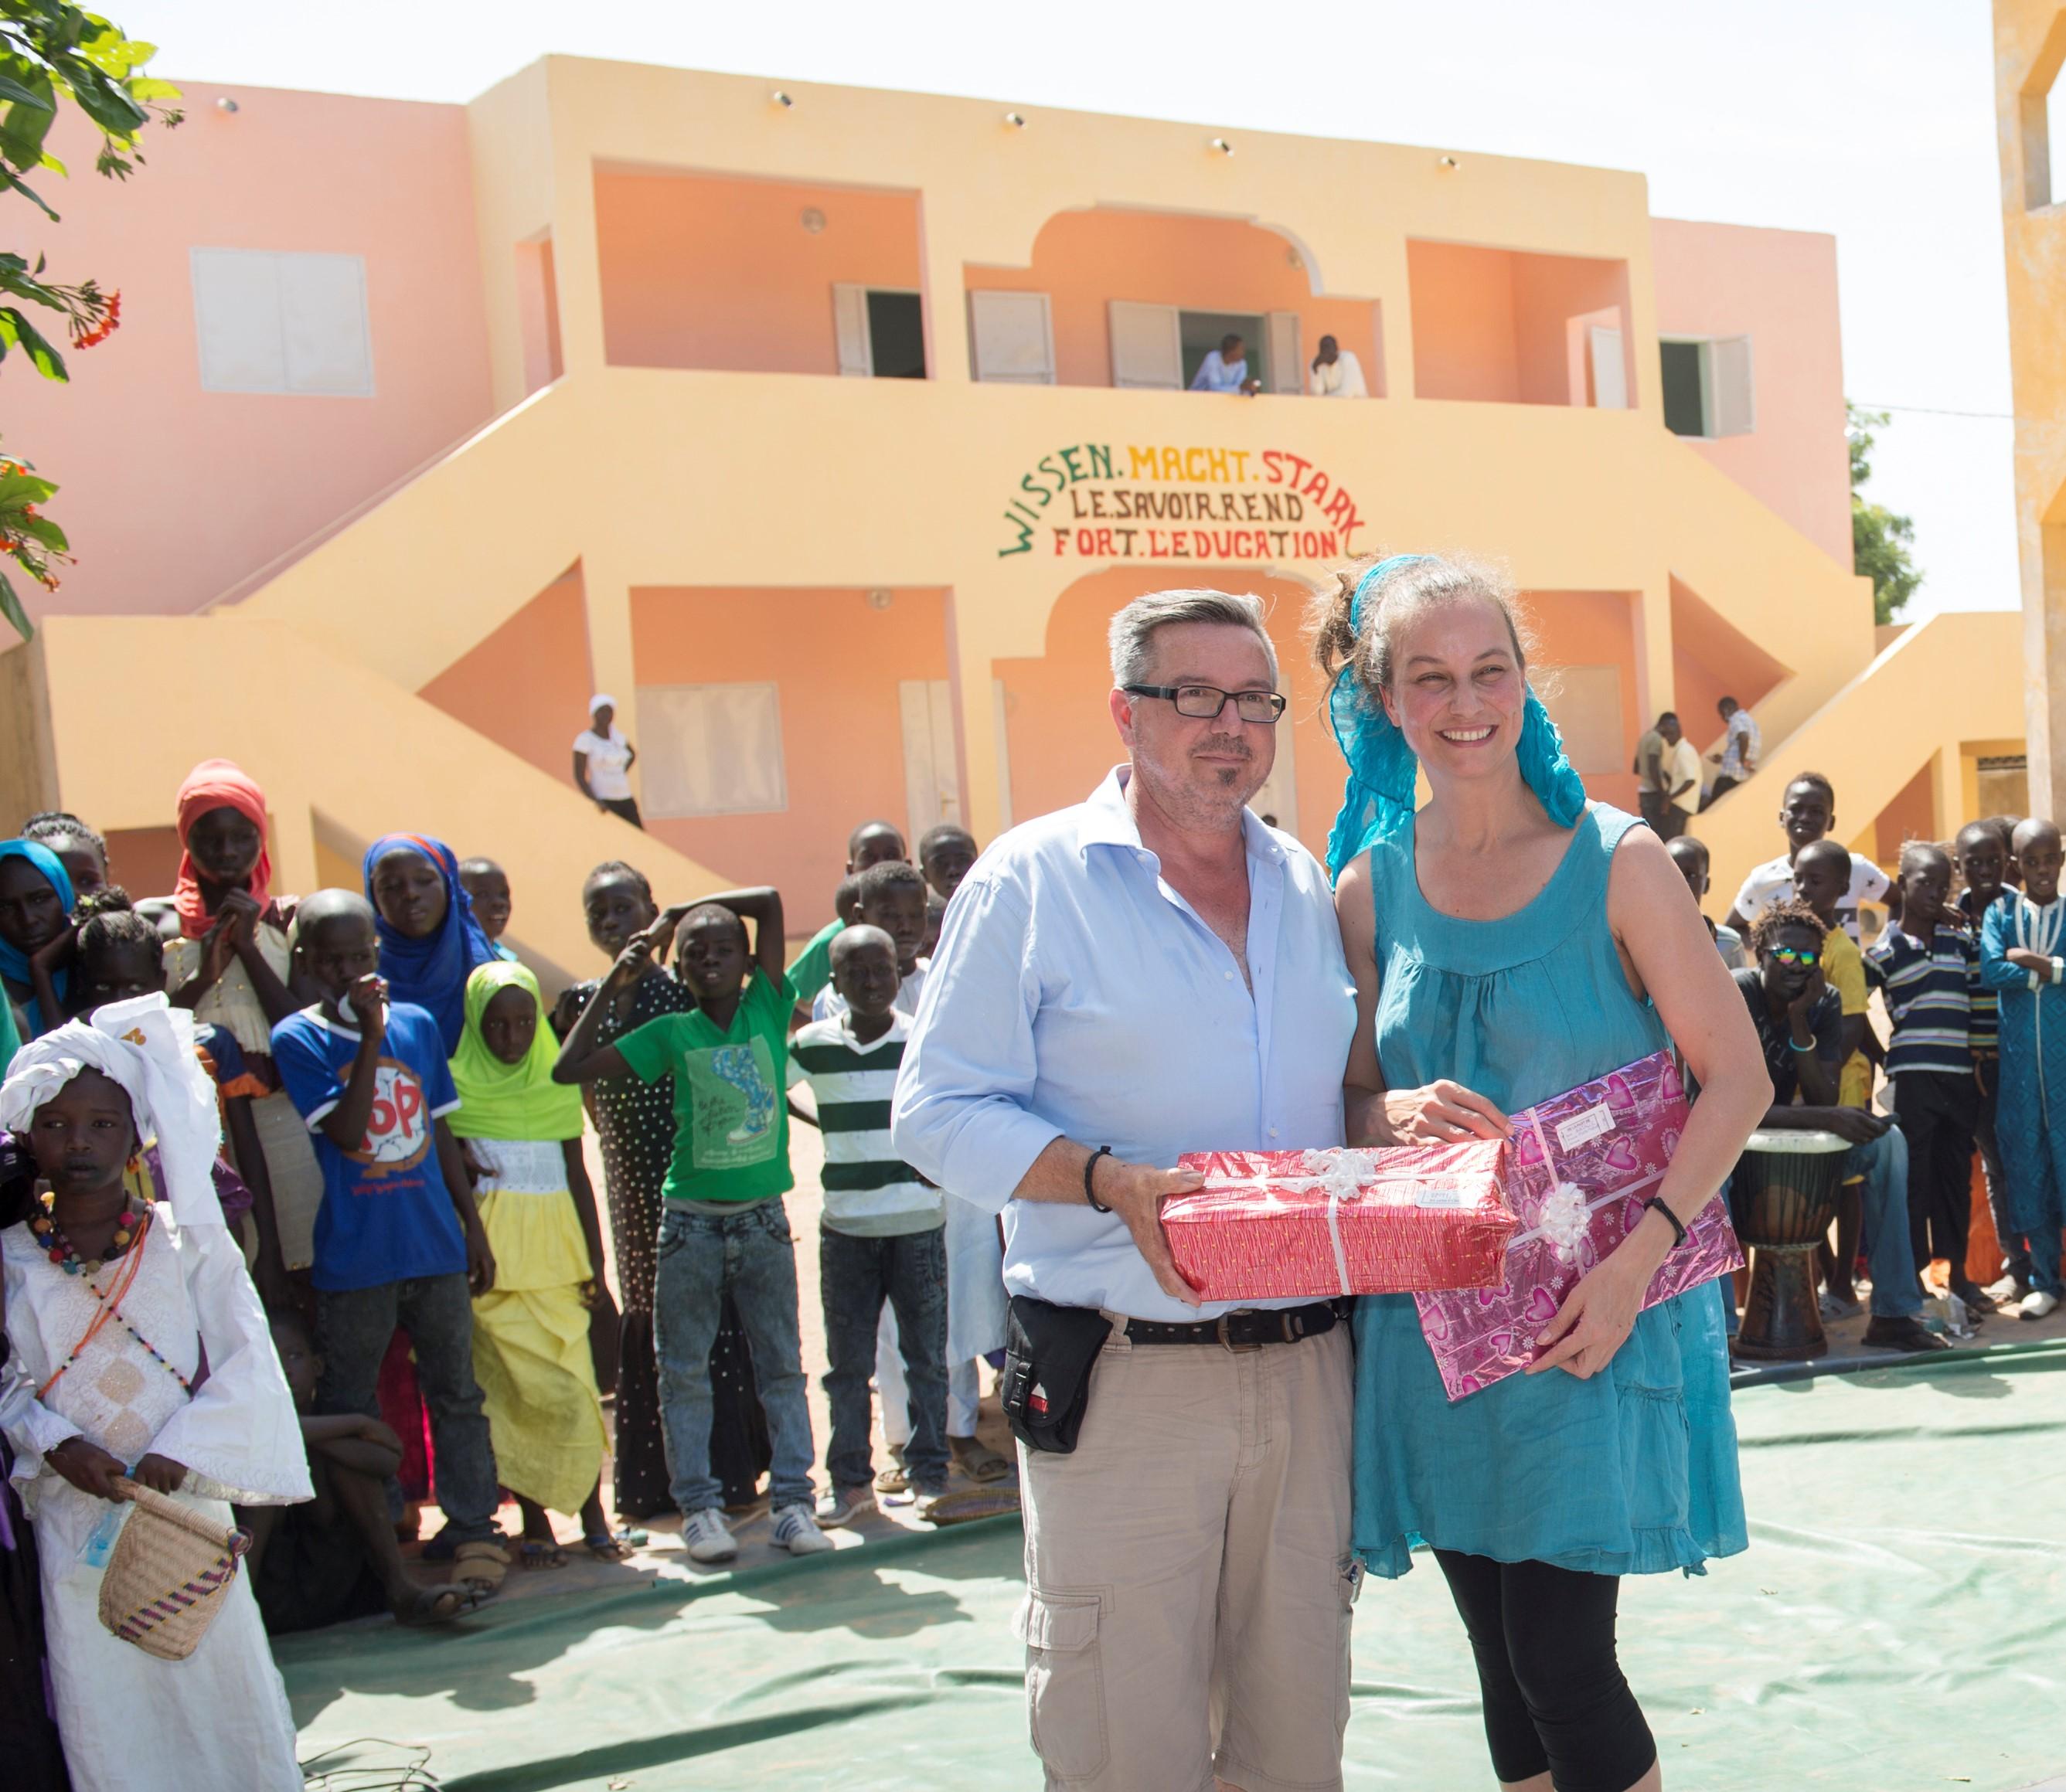 Eröffnungsfeier Grundschule 2015; Foto: ©MEDIArt | Andreas Uher; Projekt Wissen macht Stark, Senegal, Mbaling,